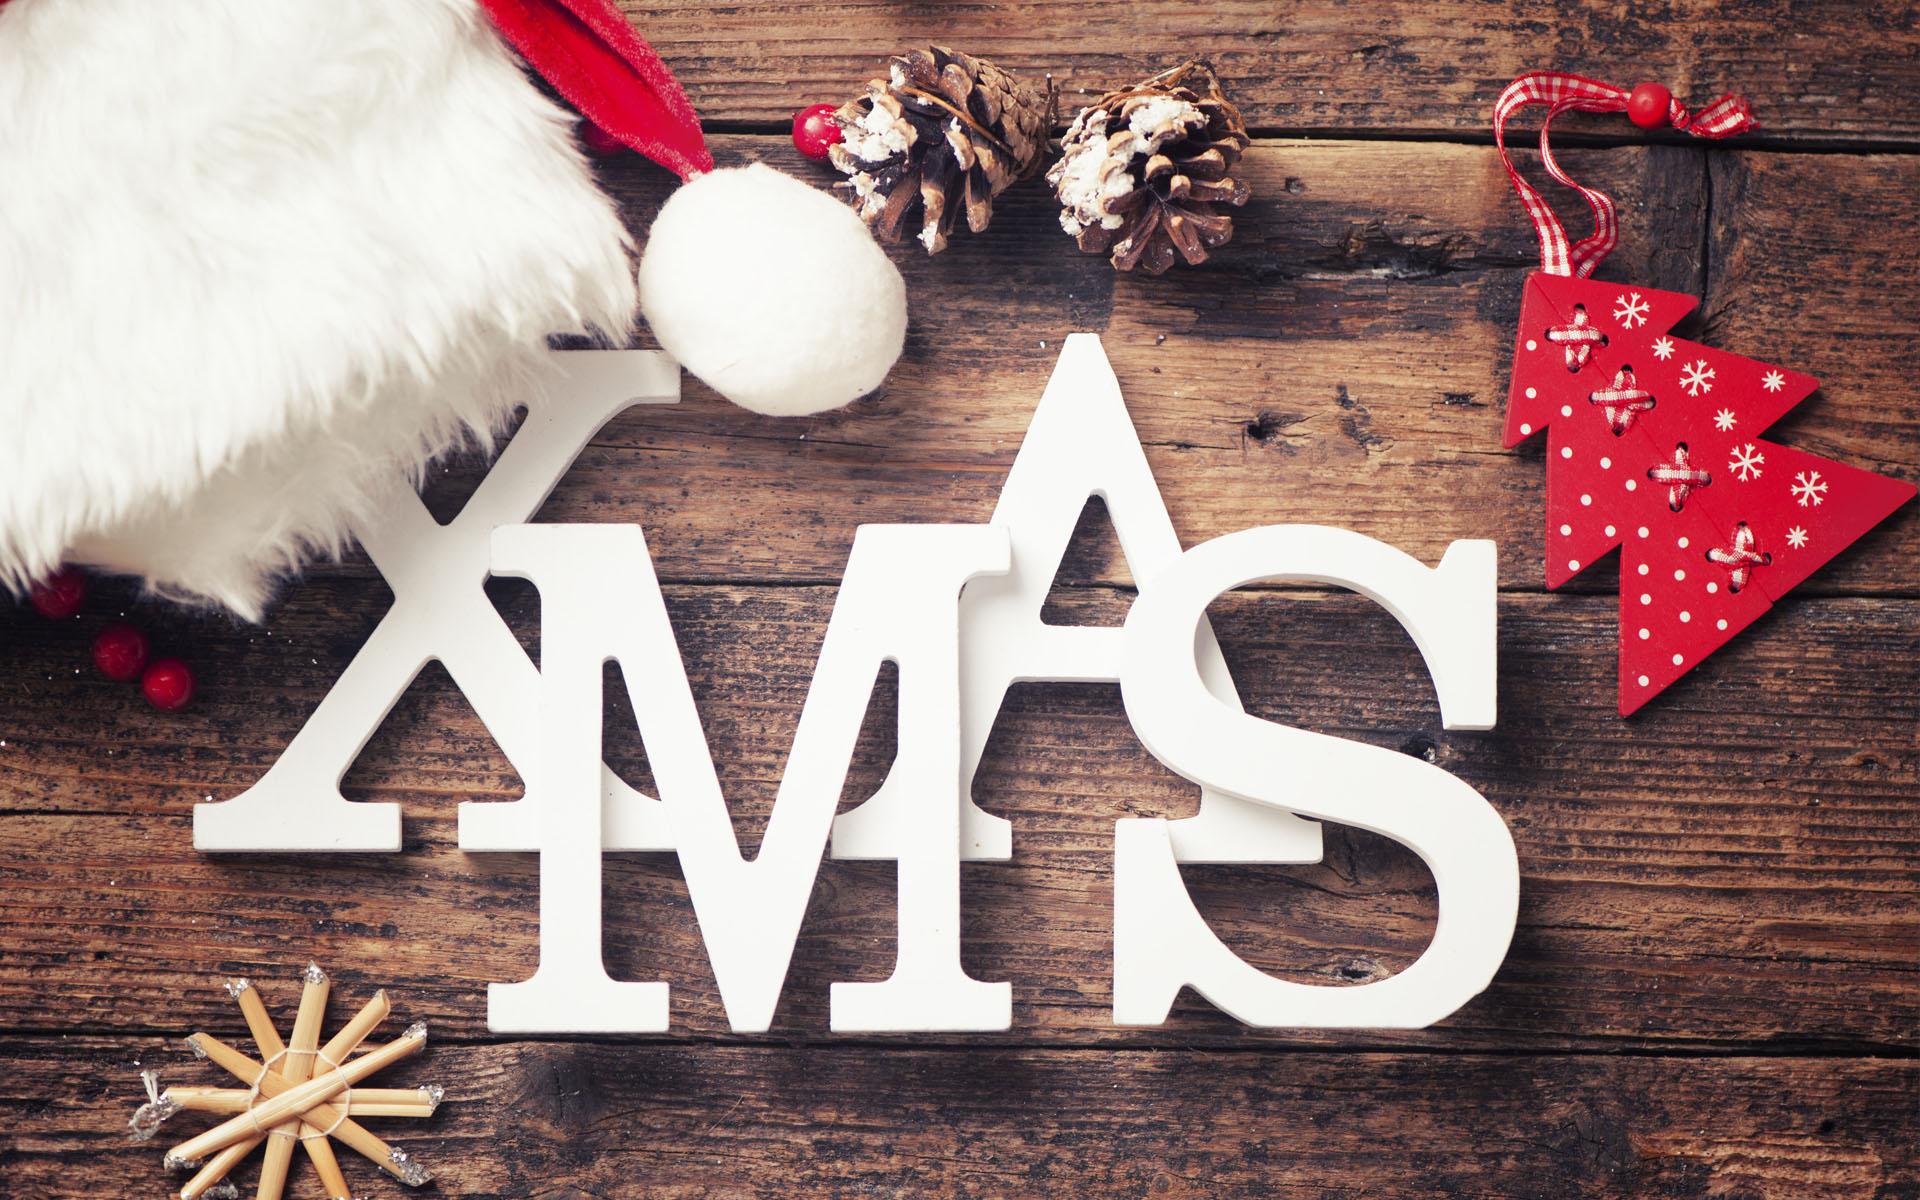 XMAS Christmas Celebration